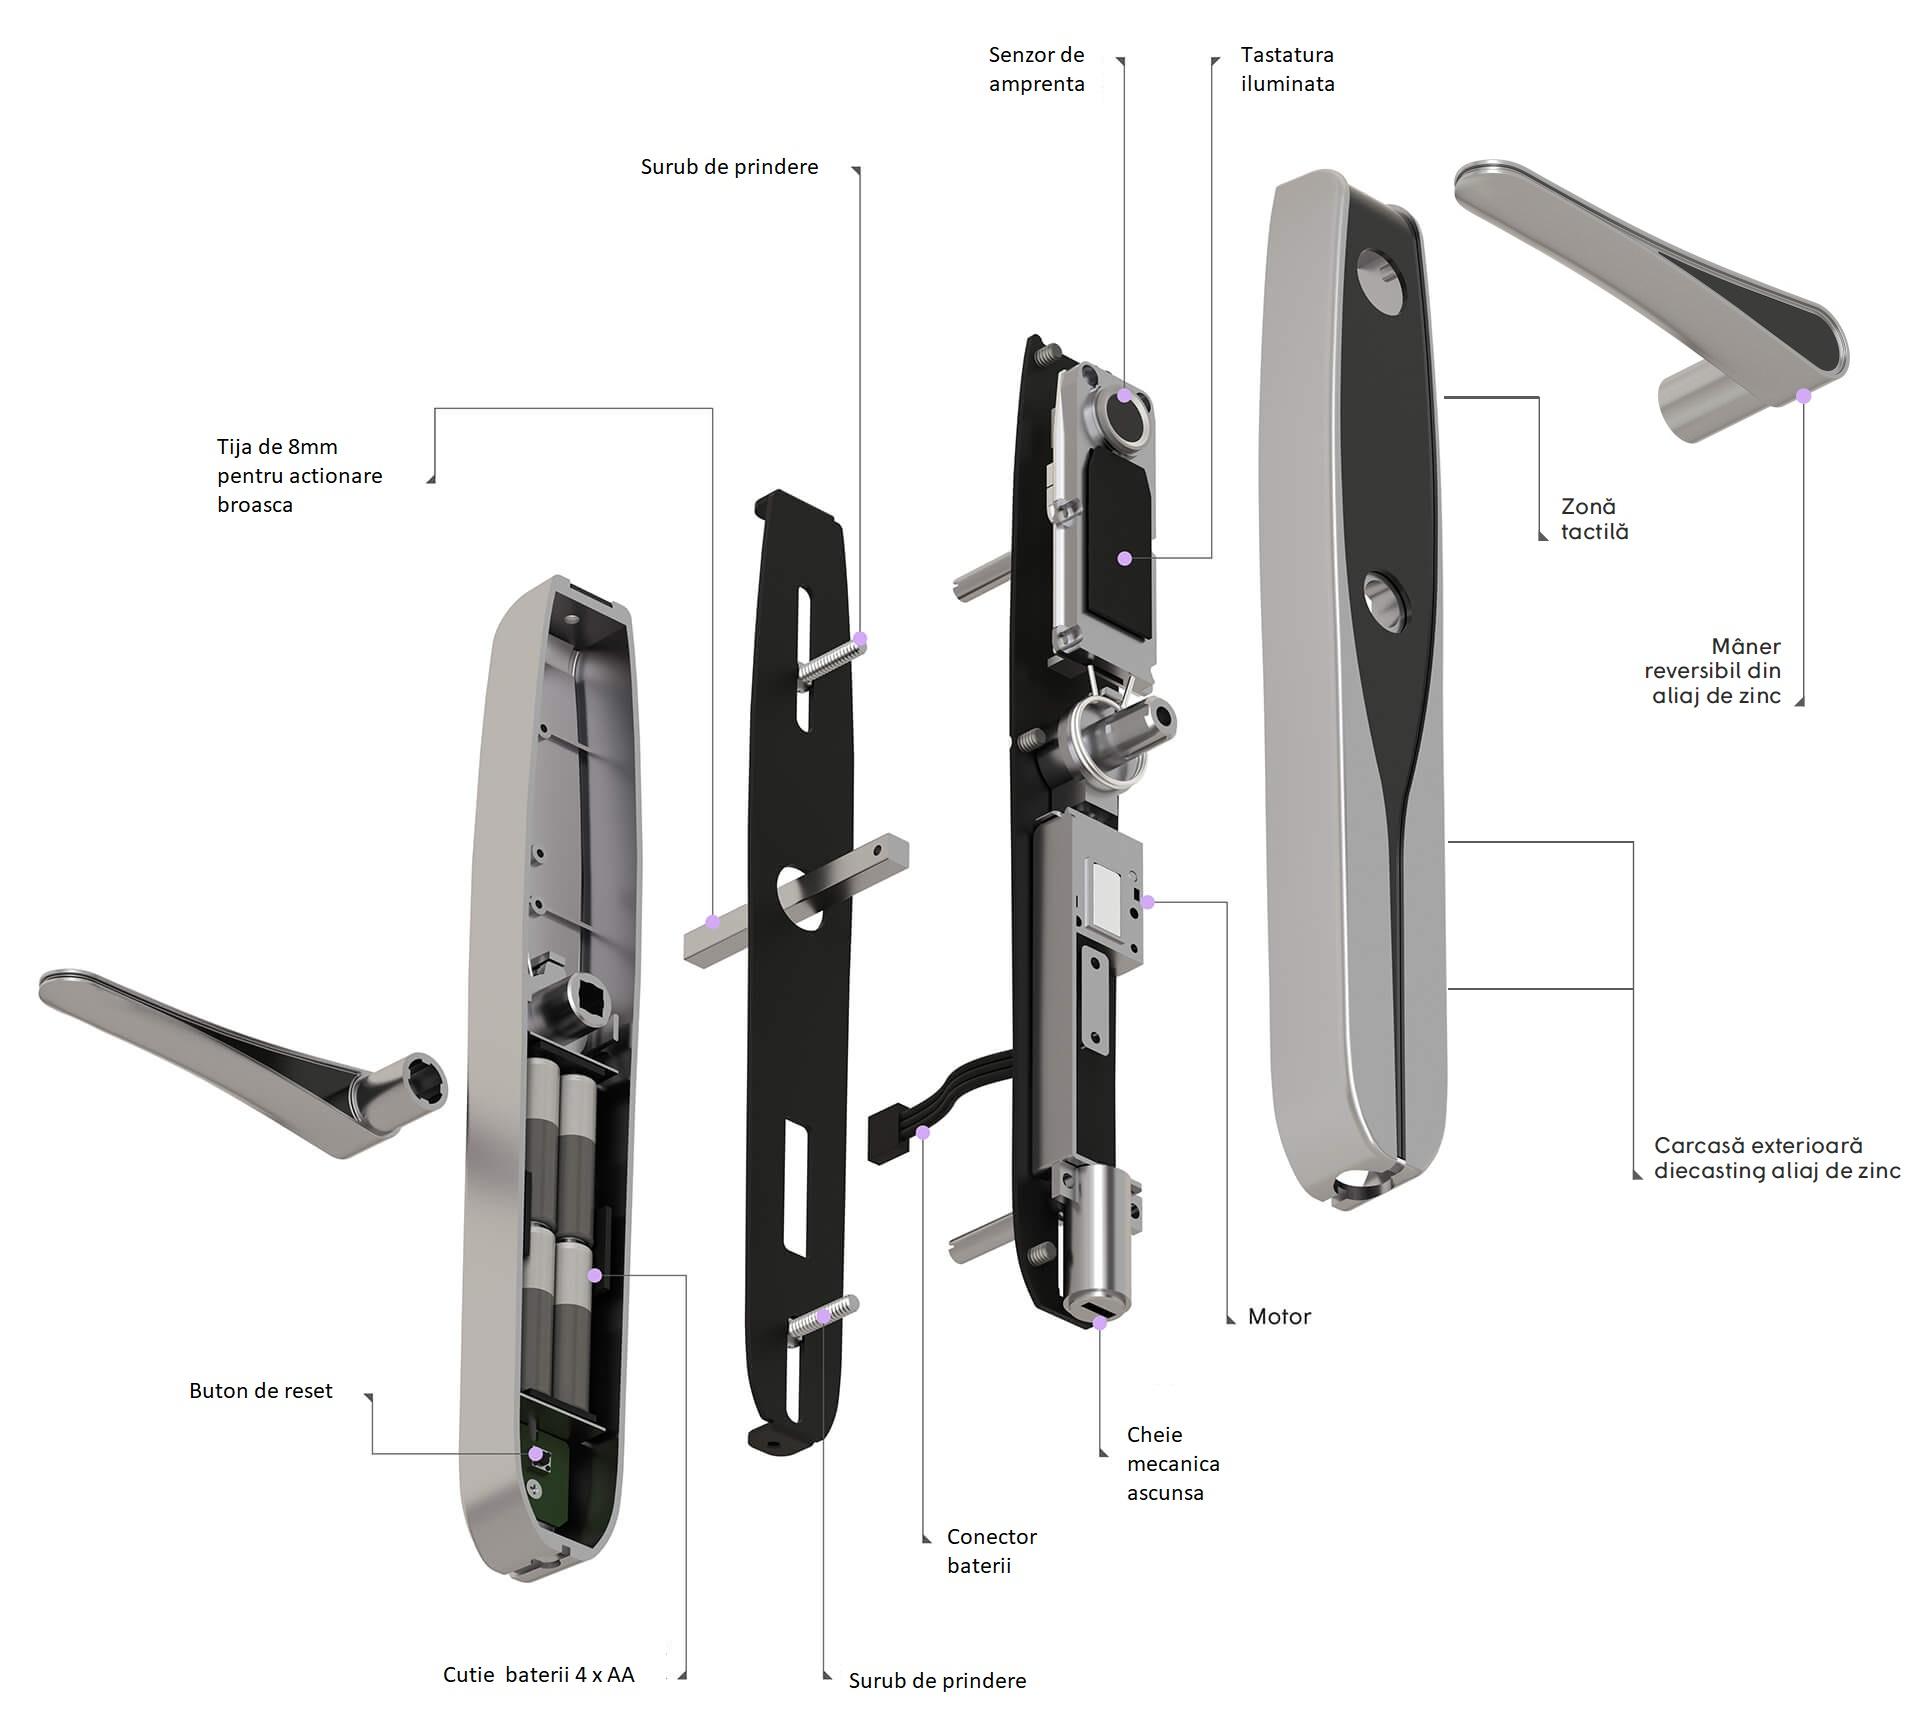 Loqness-Tuya-smart-lock-componente-interioare-1.jpg